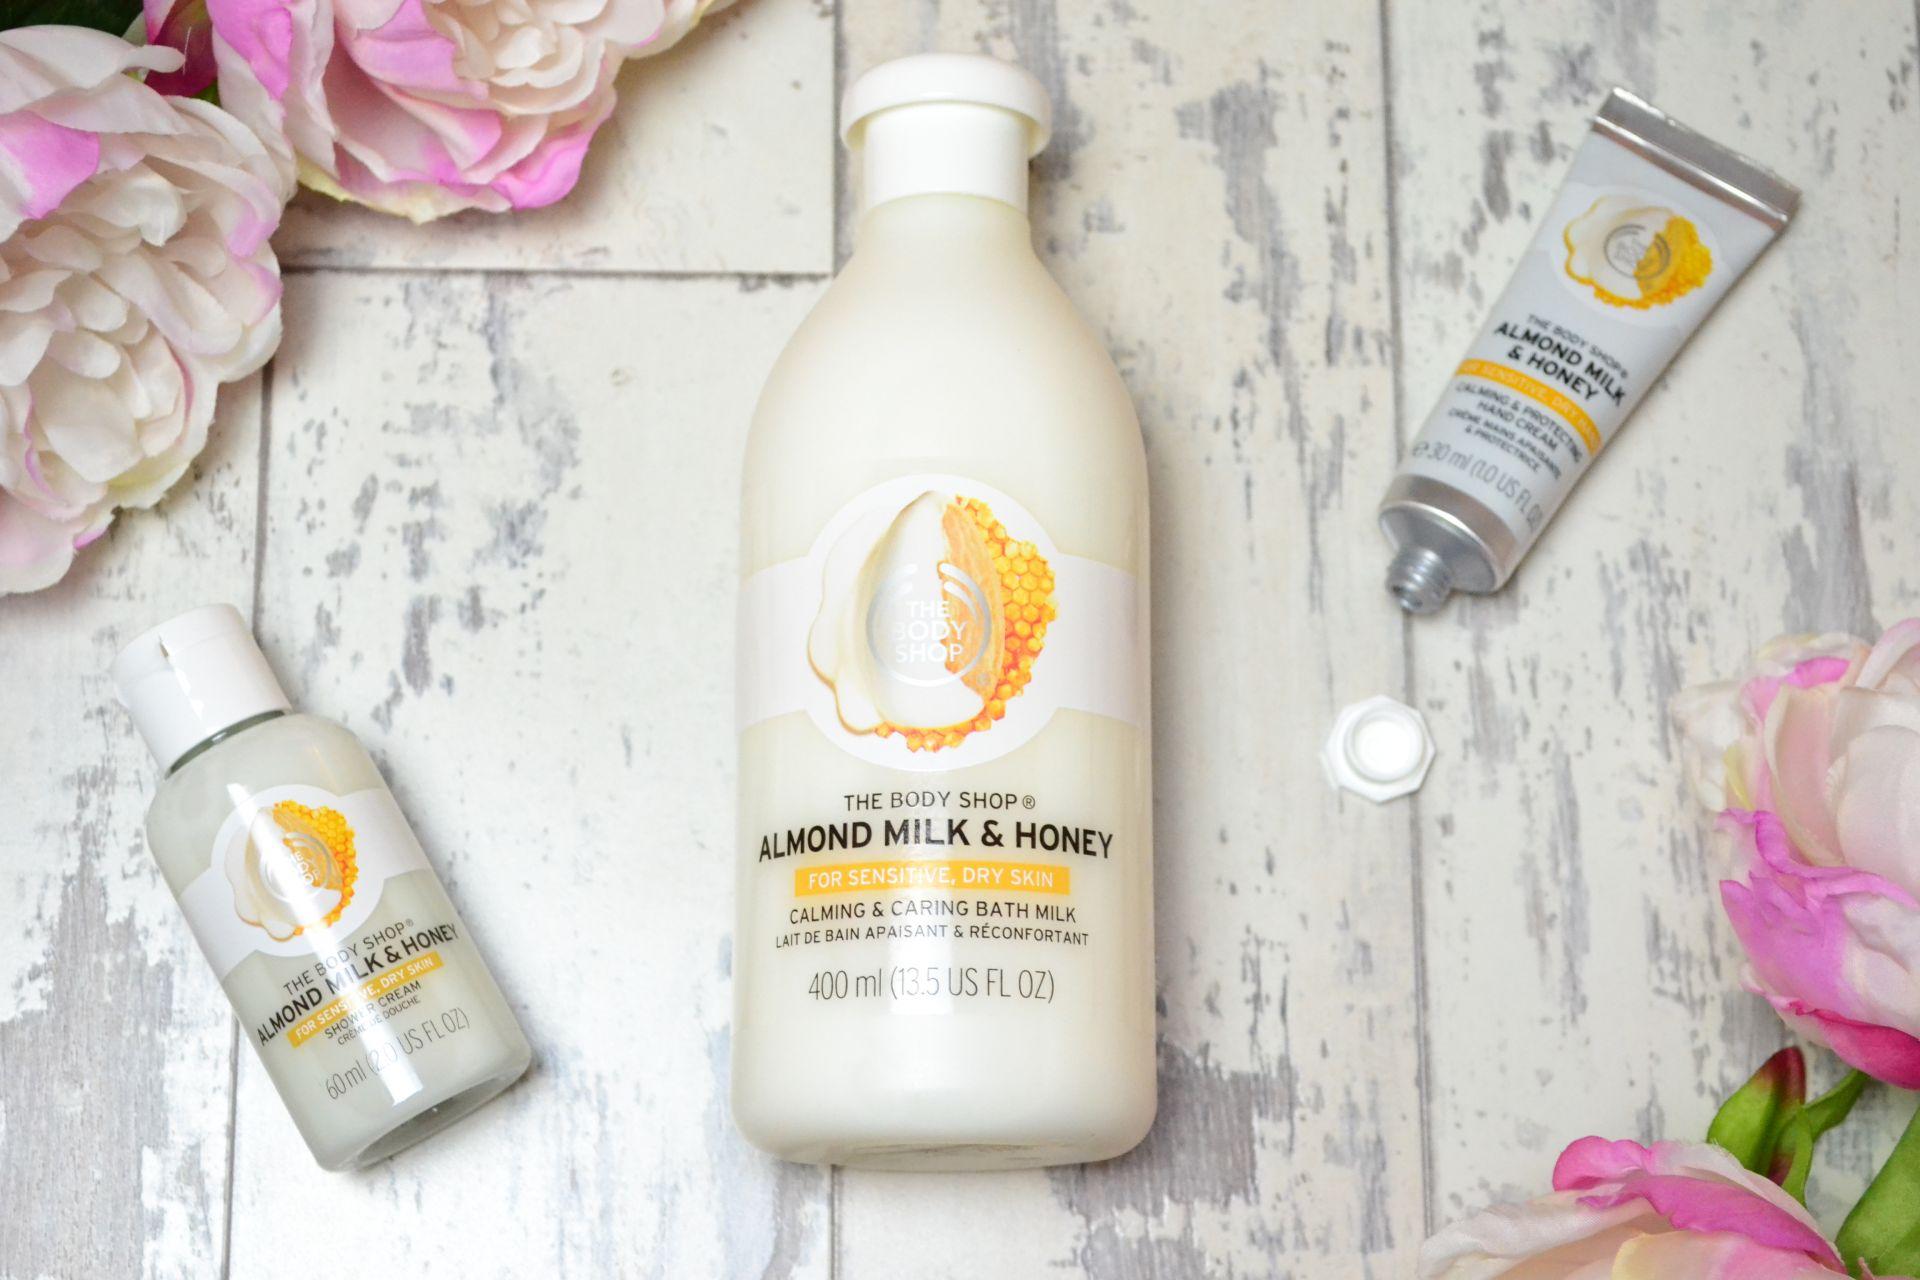 the-body-shop-almond-milk-and-honey-range